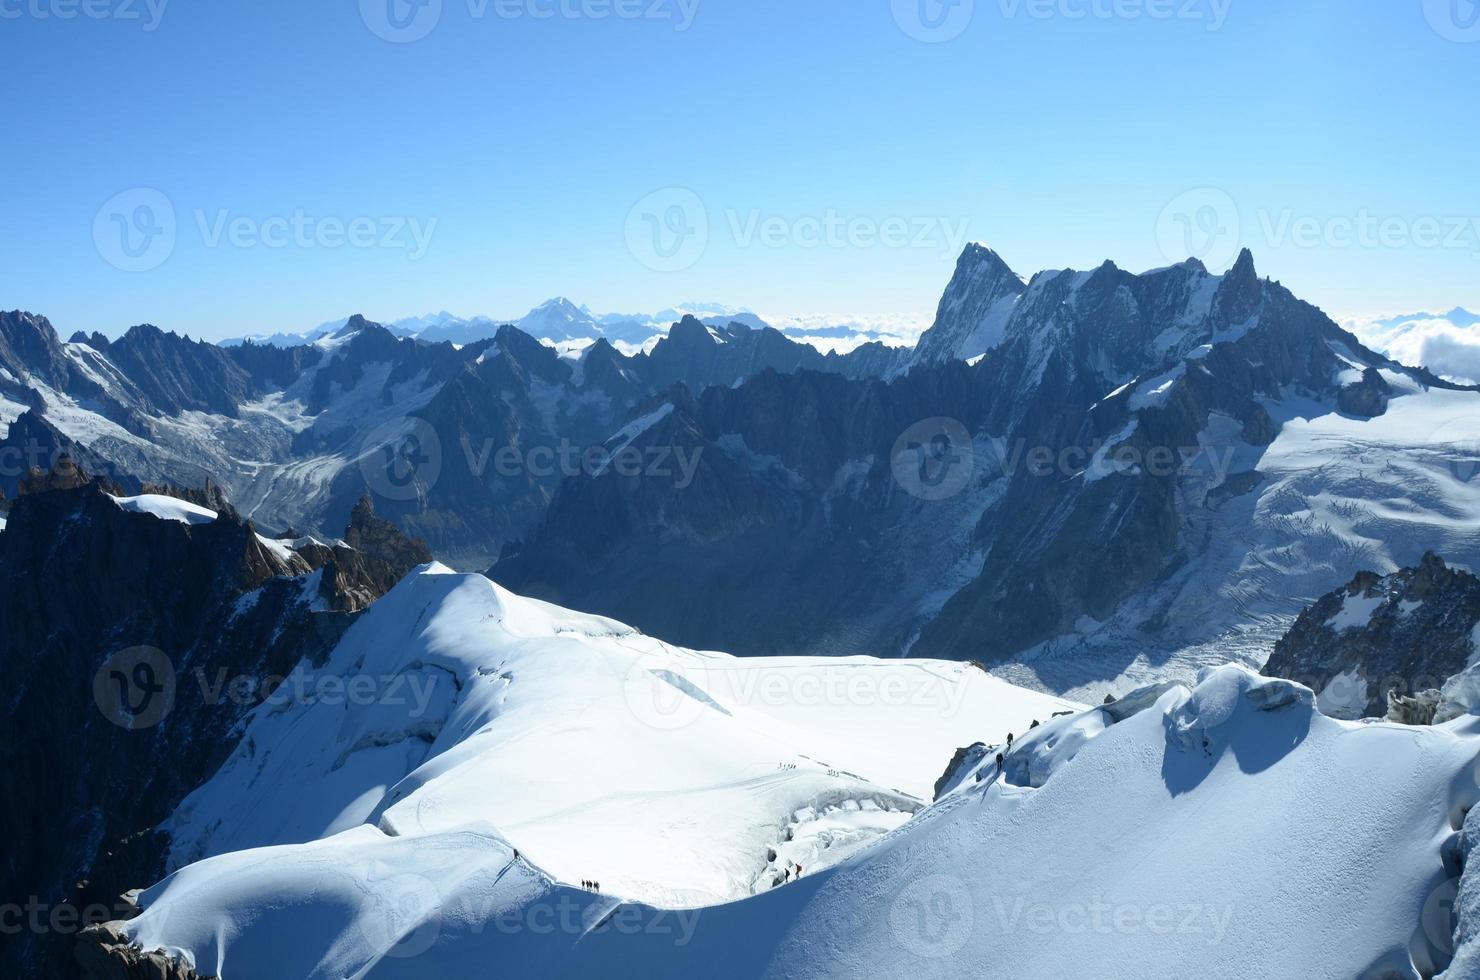 Mountain Scenery photo